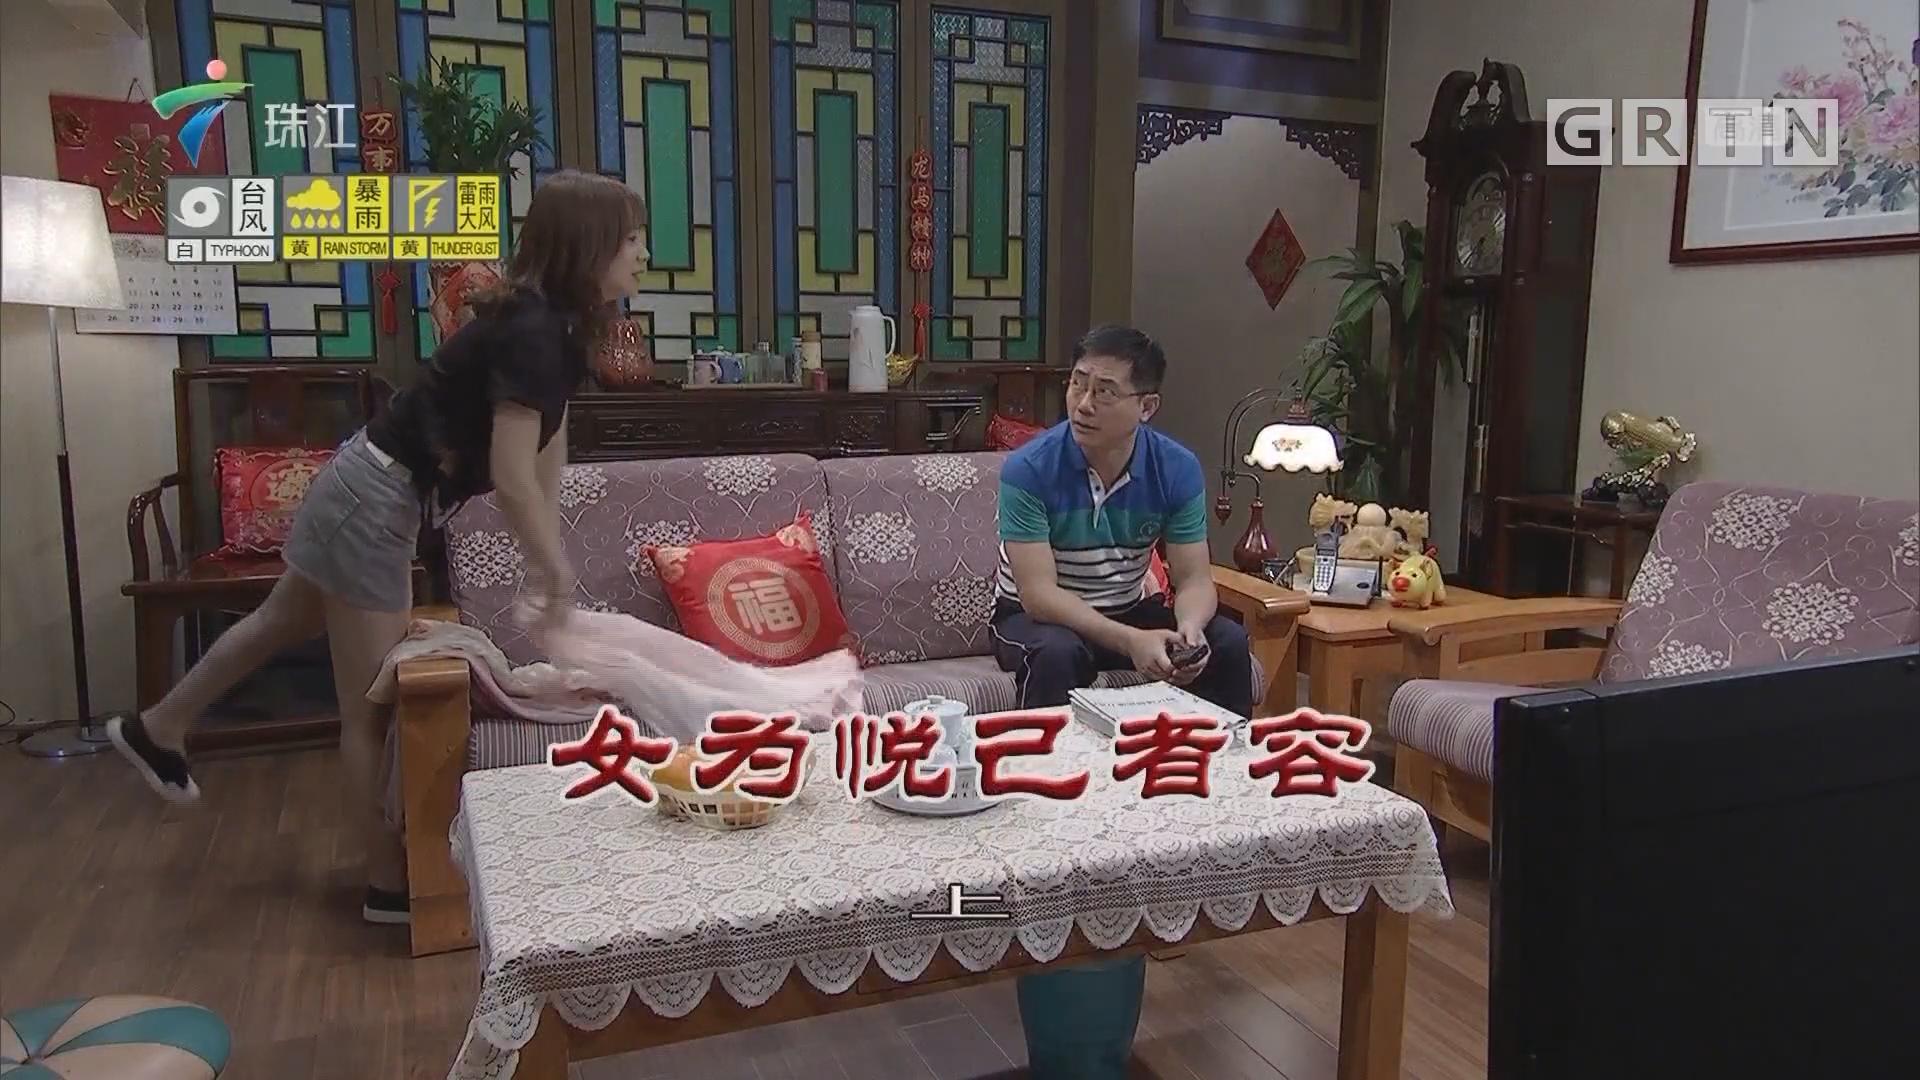 [HD][2019-08-25]外来媳妇本地郎:女为悦己者容(上)